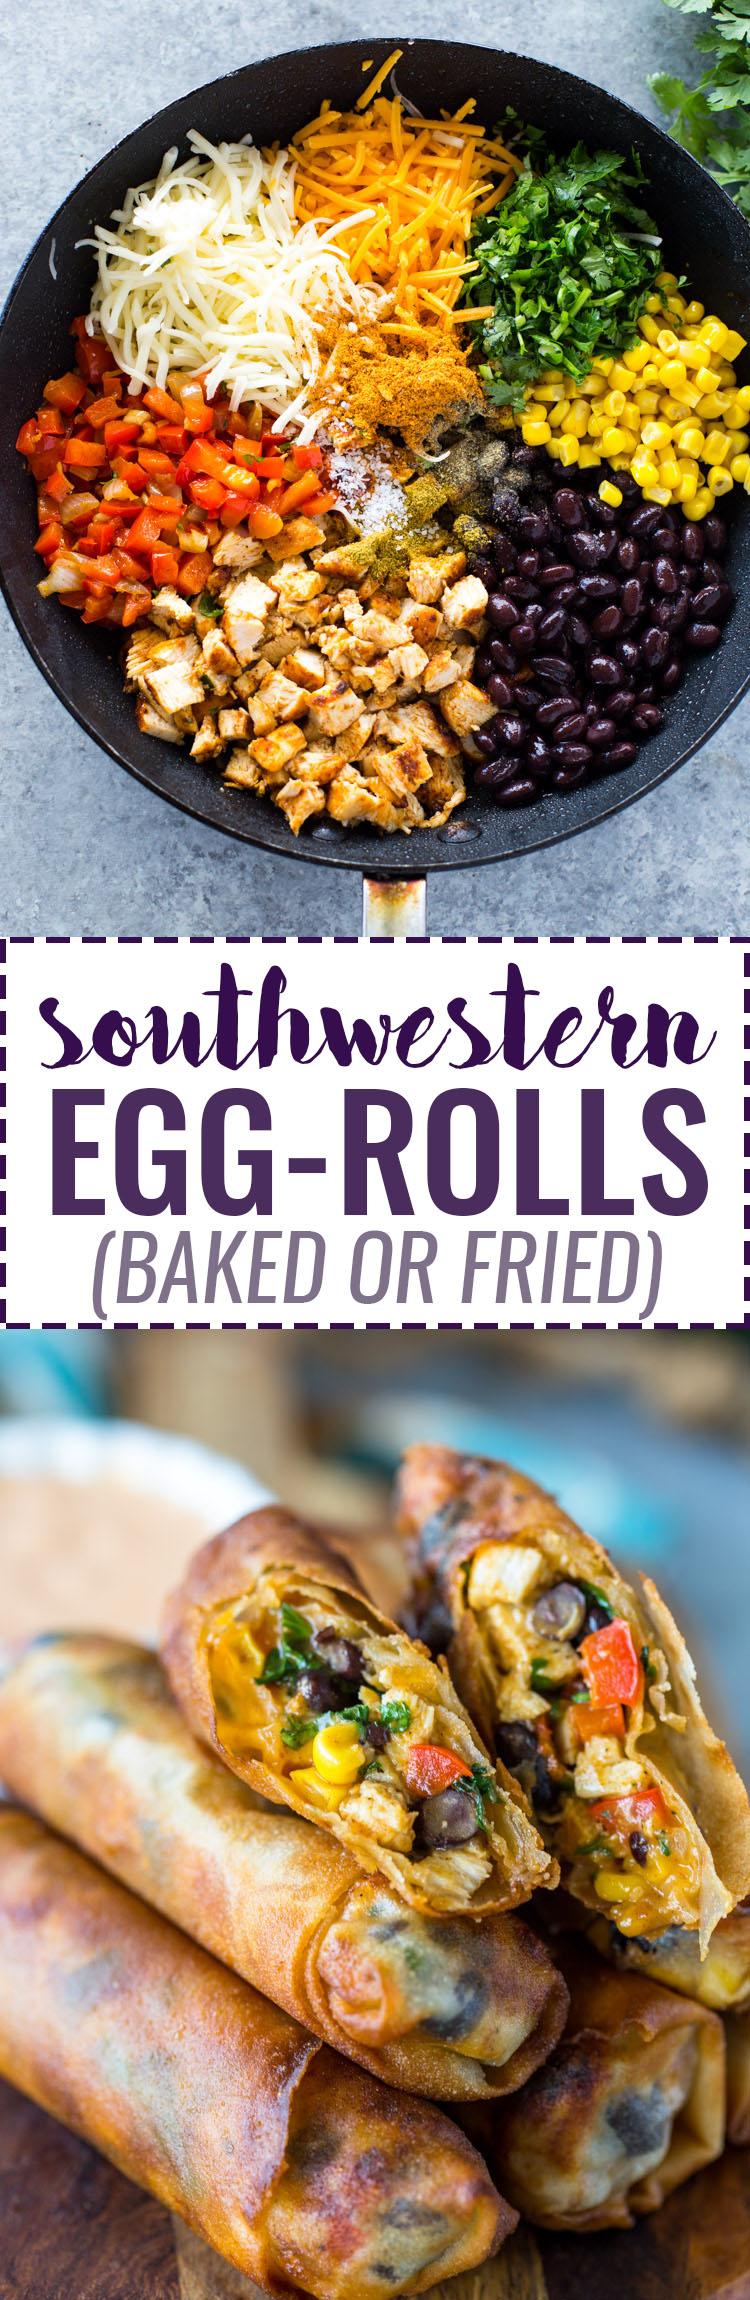 Southwestern Egg Rolls (Baked or Fried)